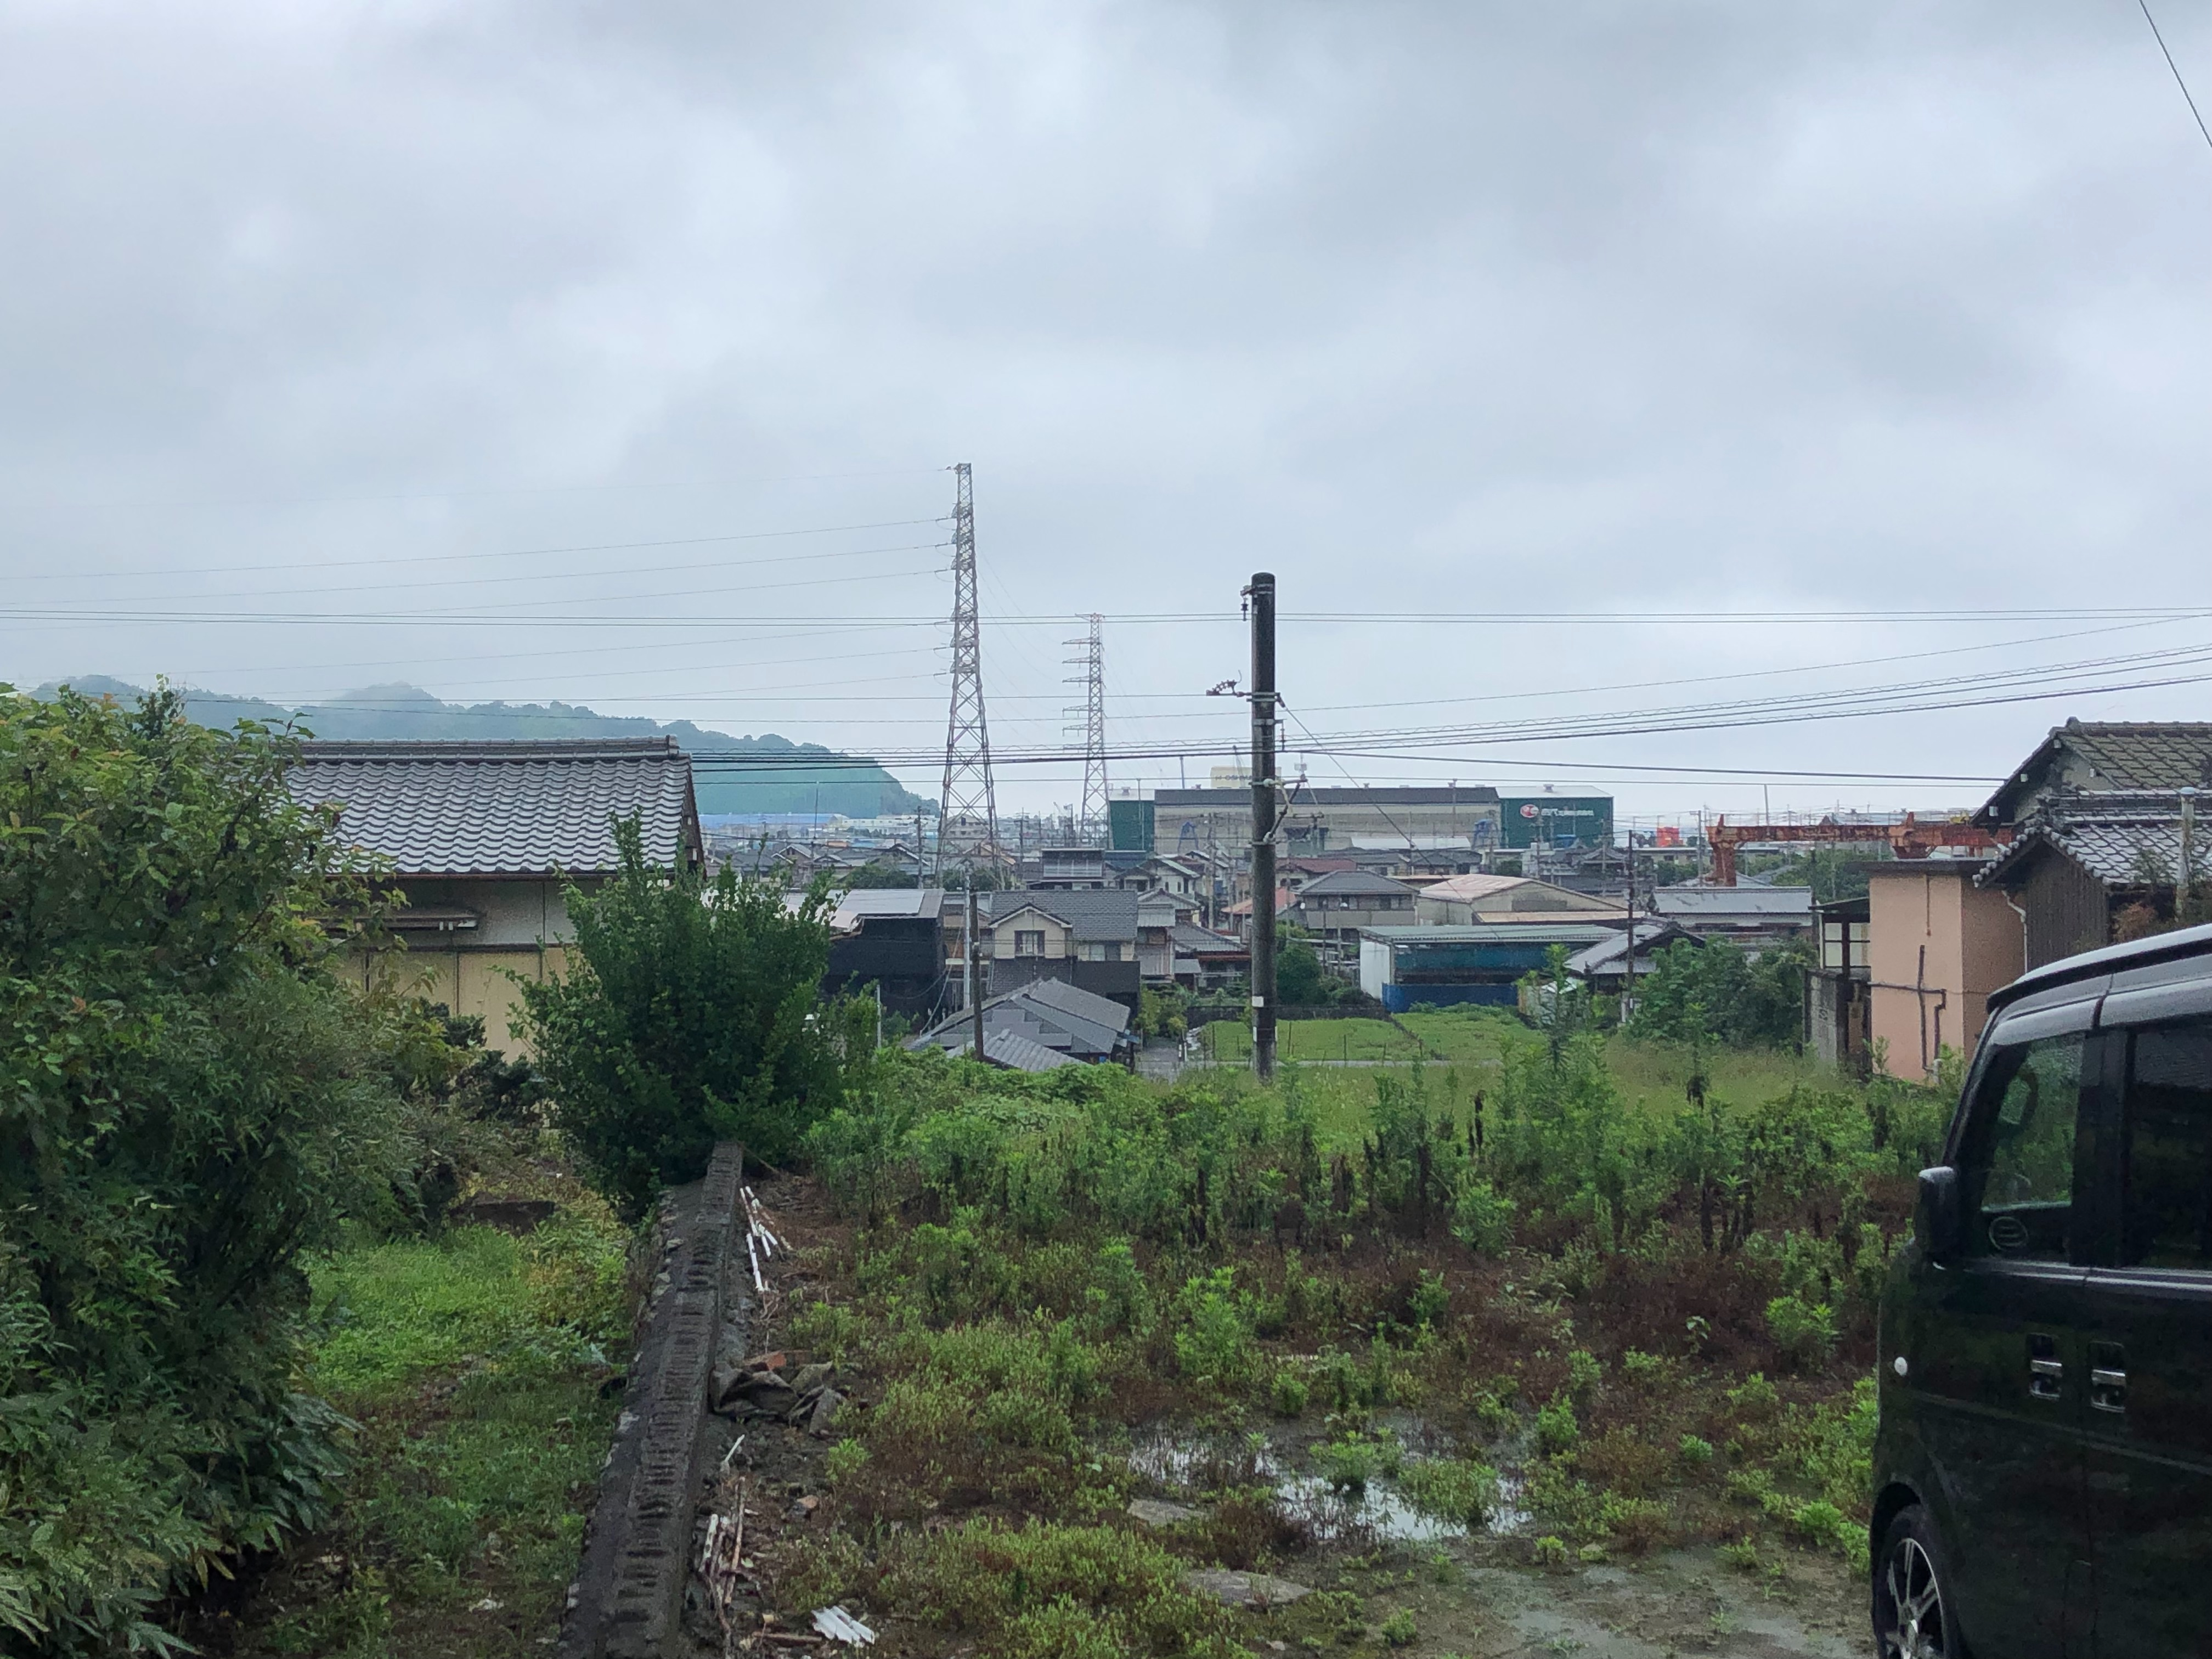 f:id:masanori-kato1972:20190714185037j:image